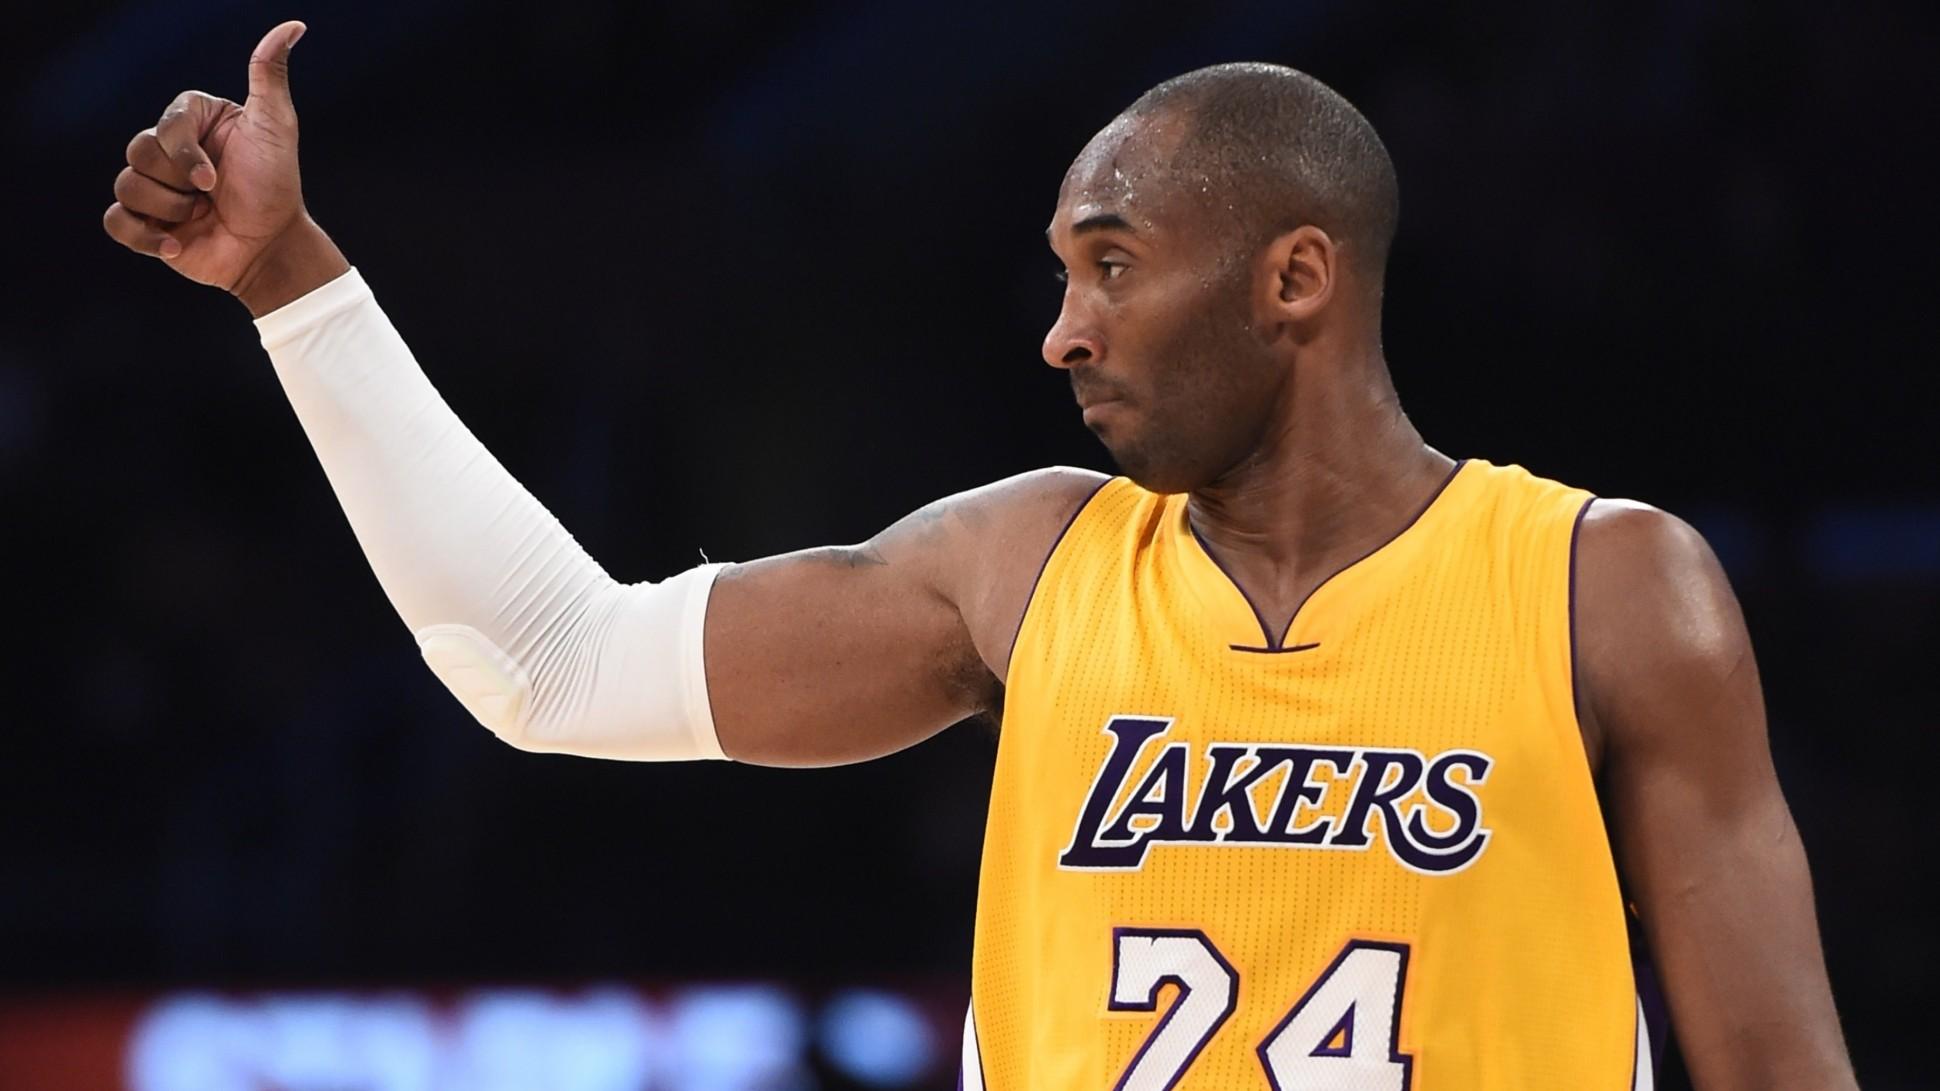 Kobe Bryant to Retire After 2015-16 Season